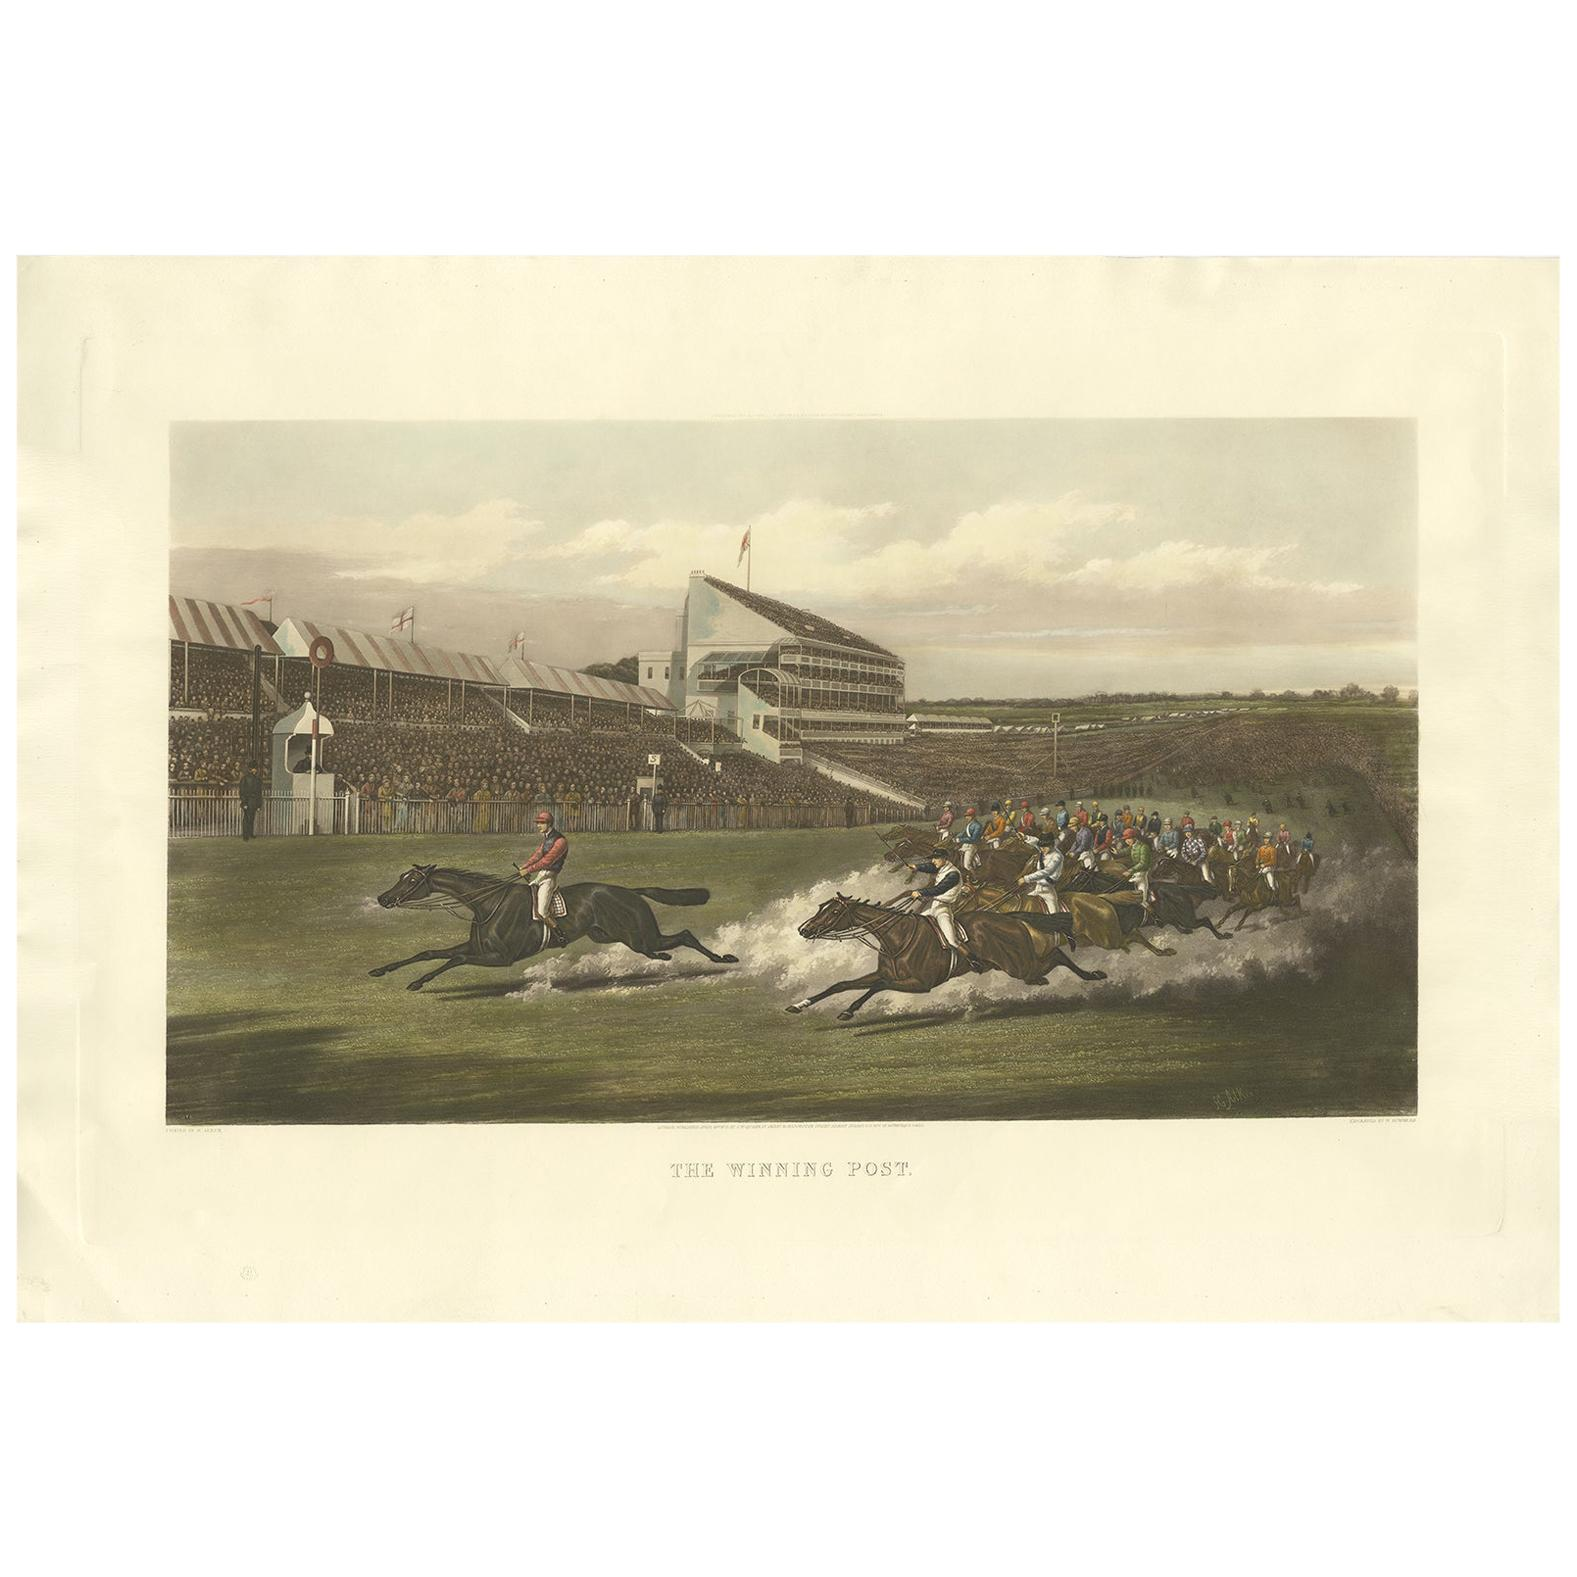 Antique Horse Racing Print 'The Winning Post' Made after H. Alken, circa 1900